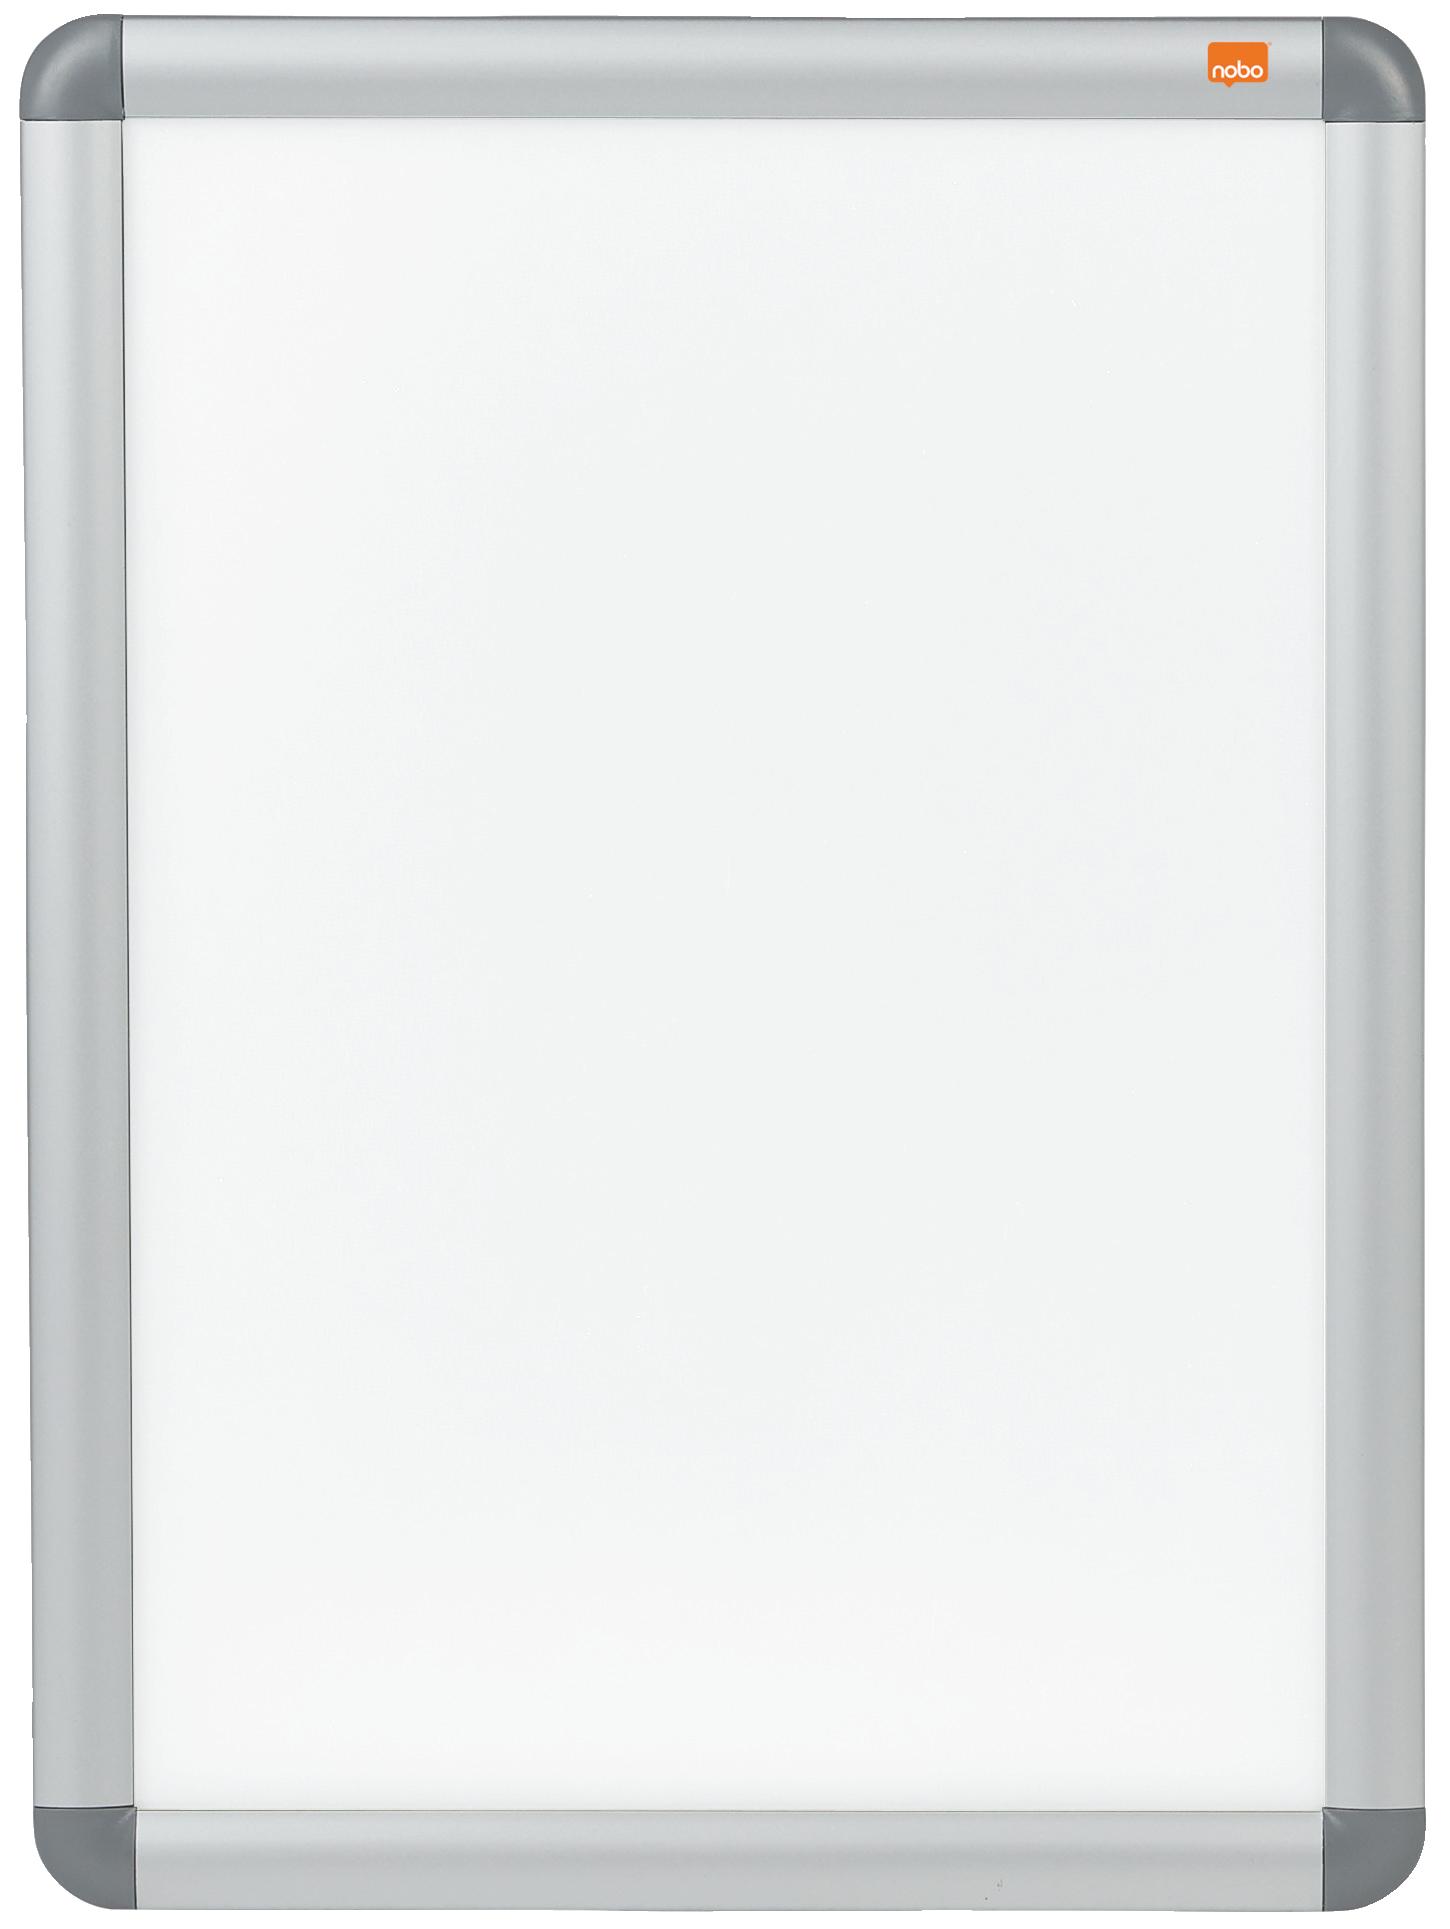 Nobo Clip Down Frame A3 Aluminium Frame Plastic Front Silver/Grey 1902213